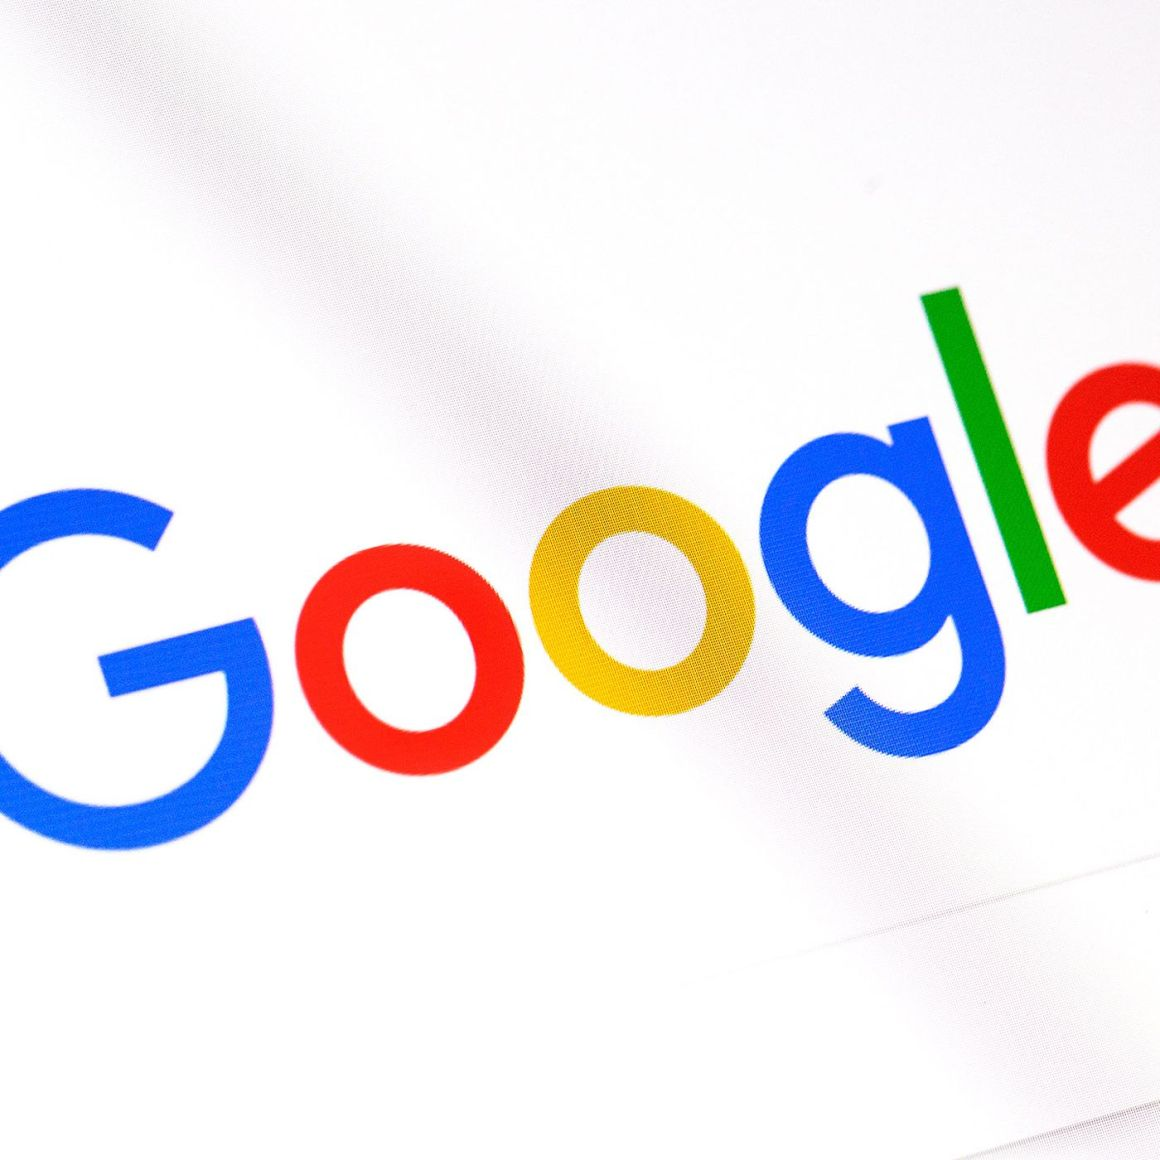 Google is shuttering its URL shortening service, goo.gl - The Verge